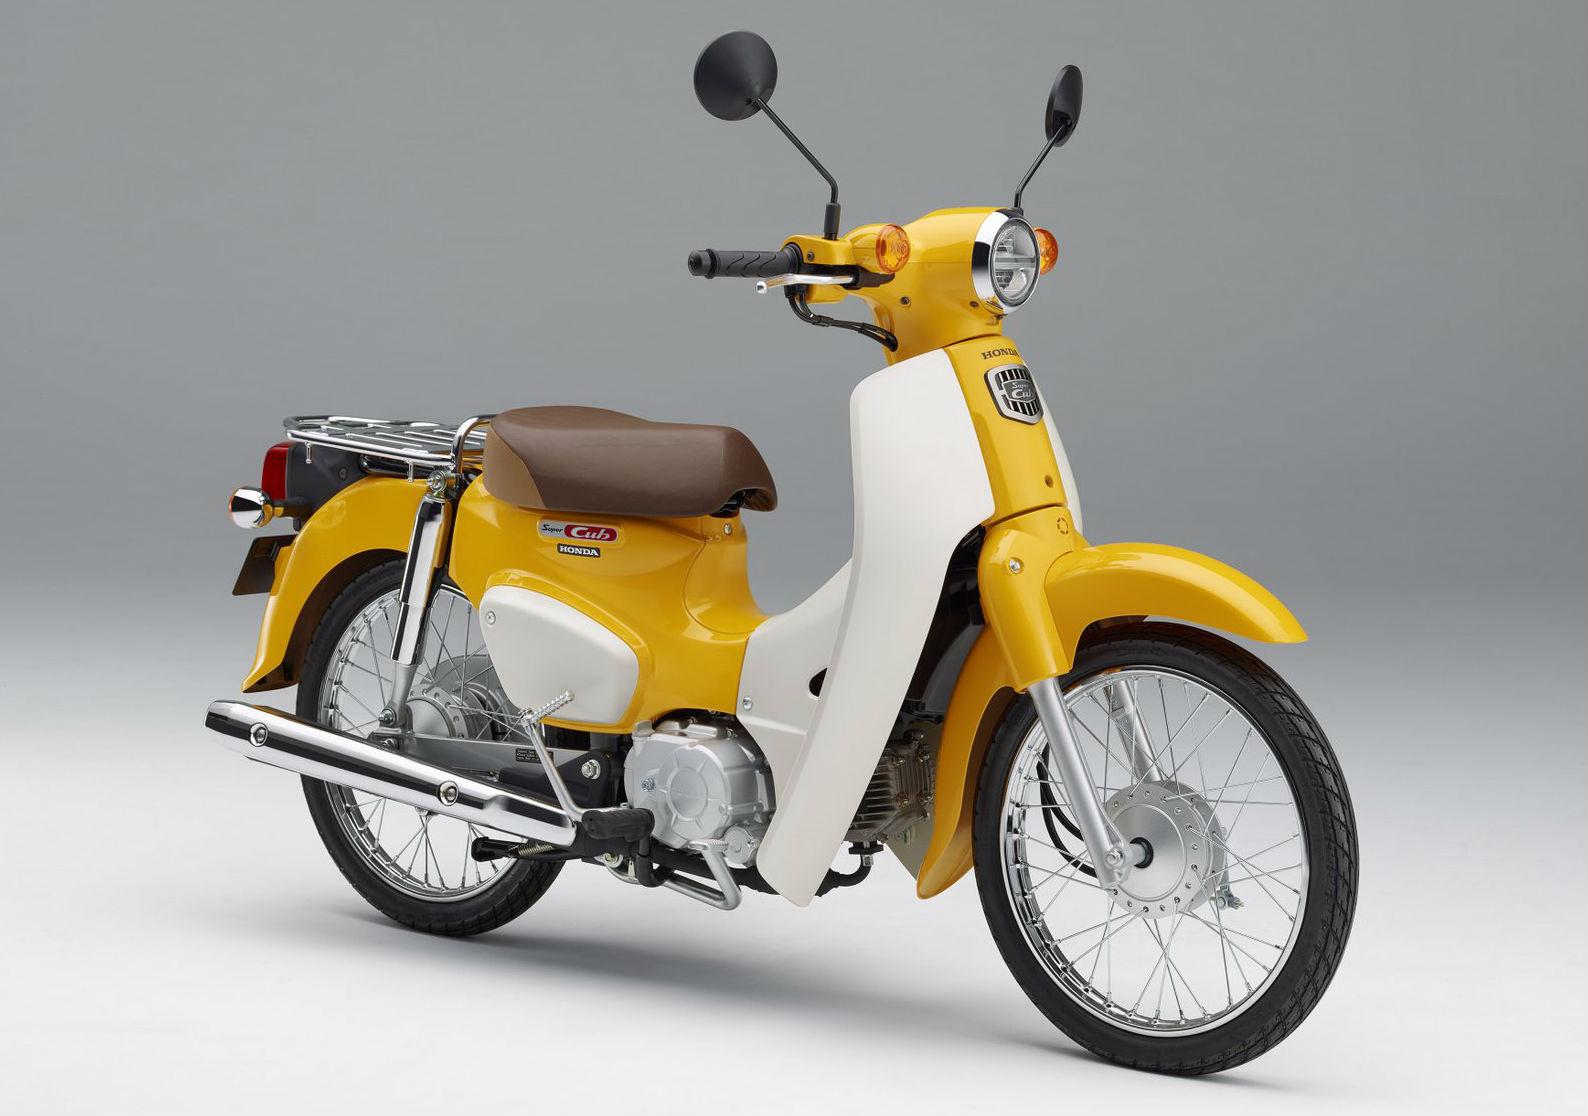 Dio bike price in bangalore dating 2